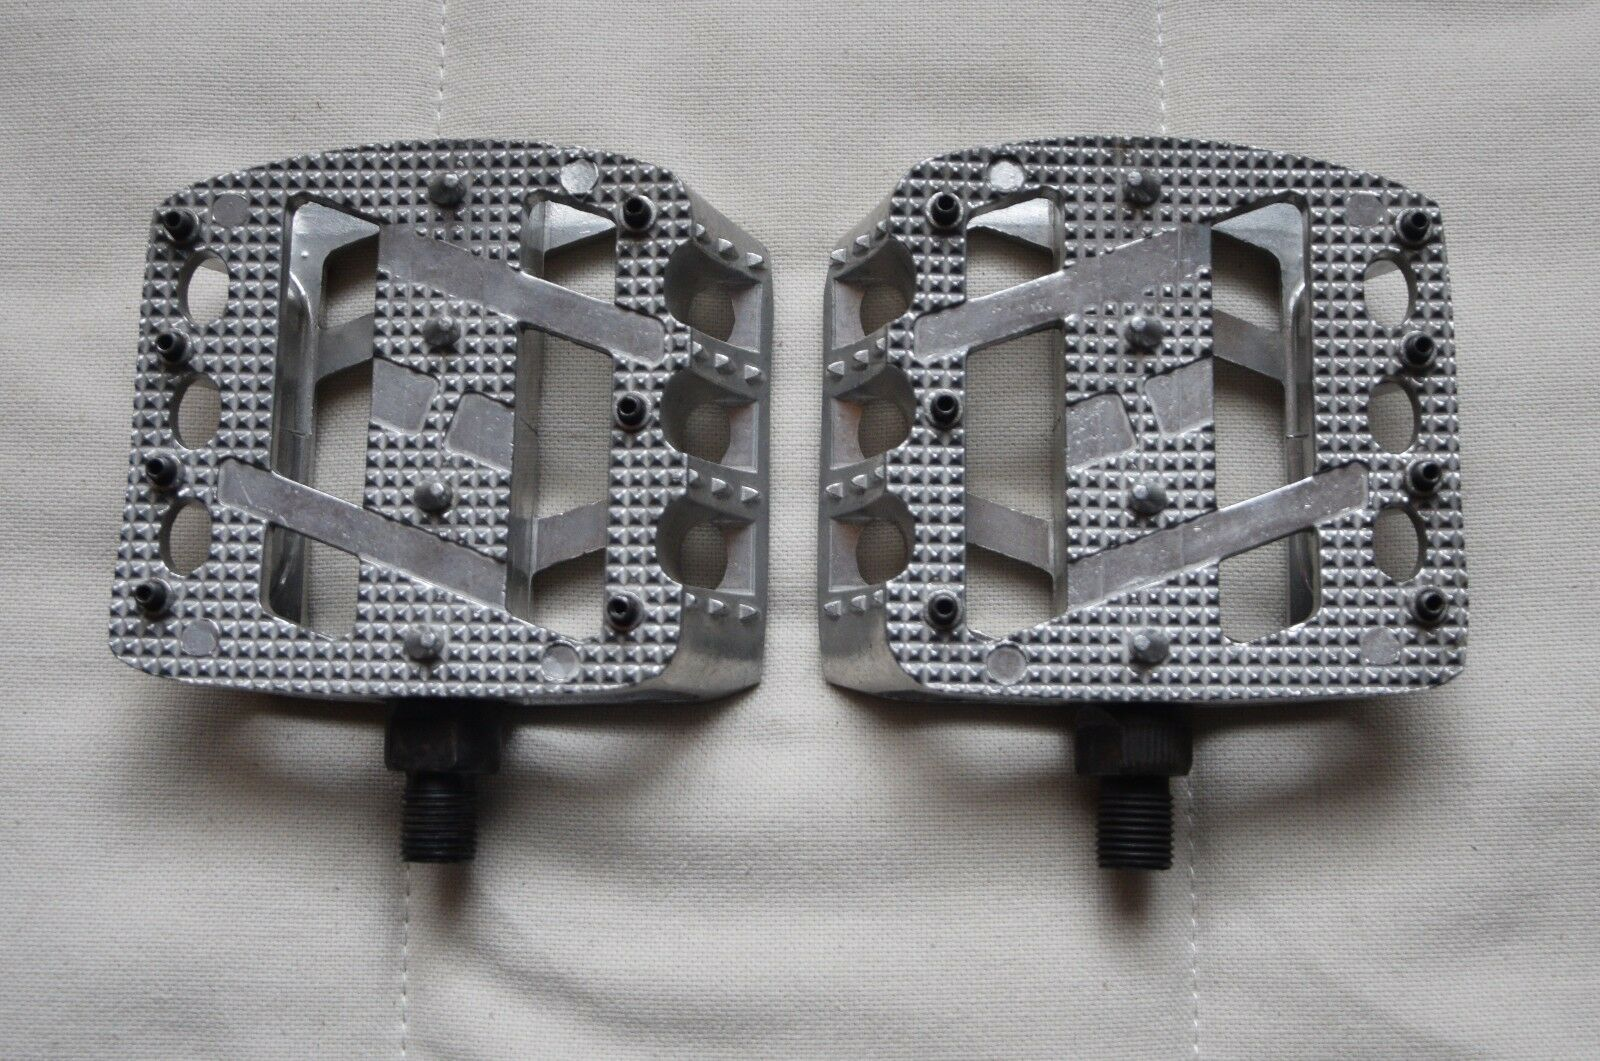 Pedale BMX 1 2 Zoll, Chrome   Aluminium  | Deutschland München